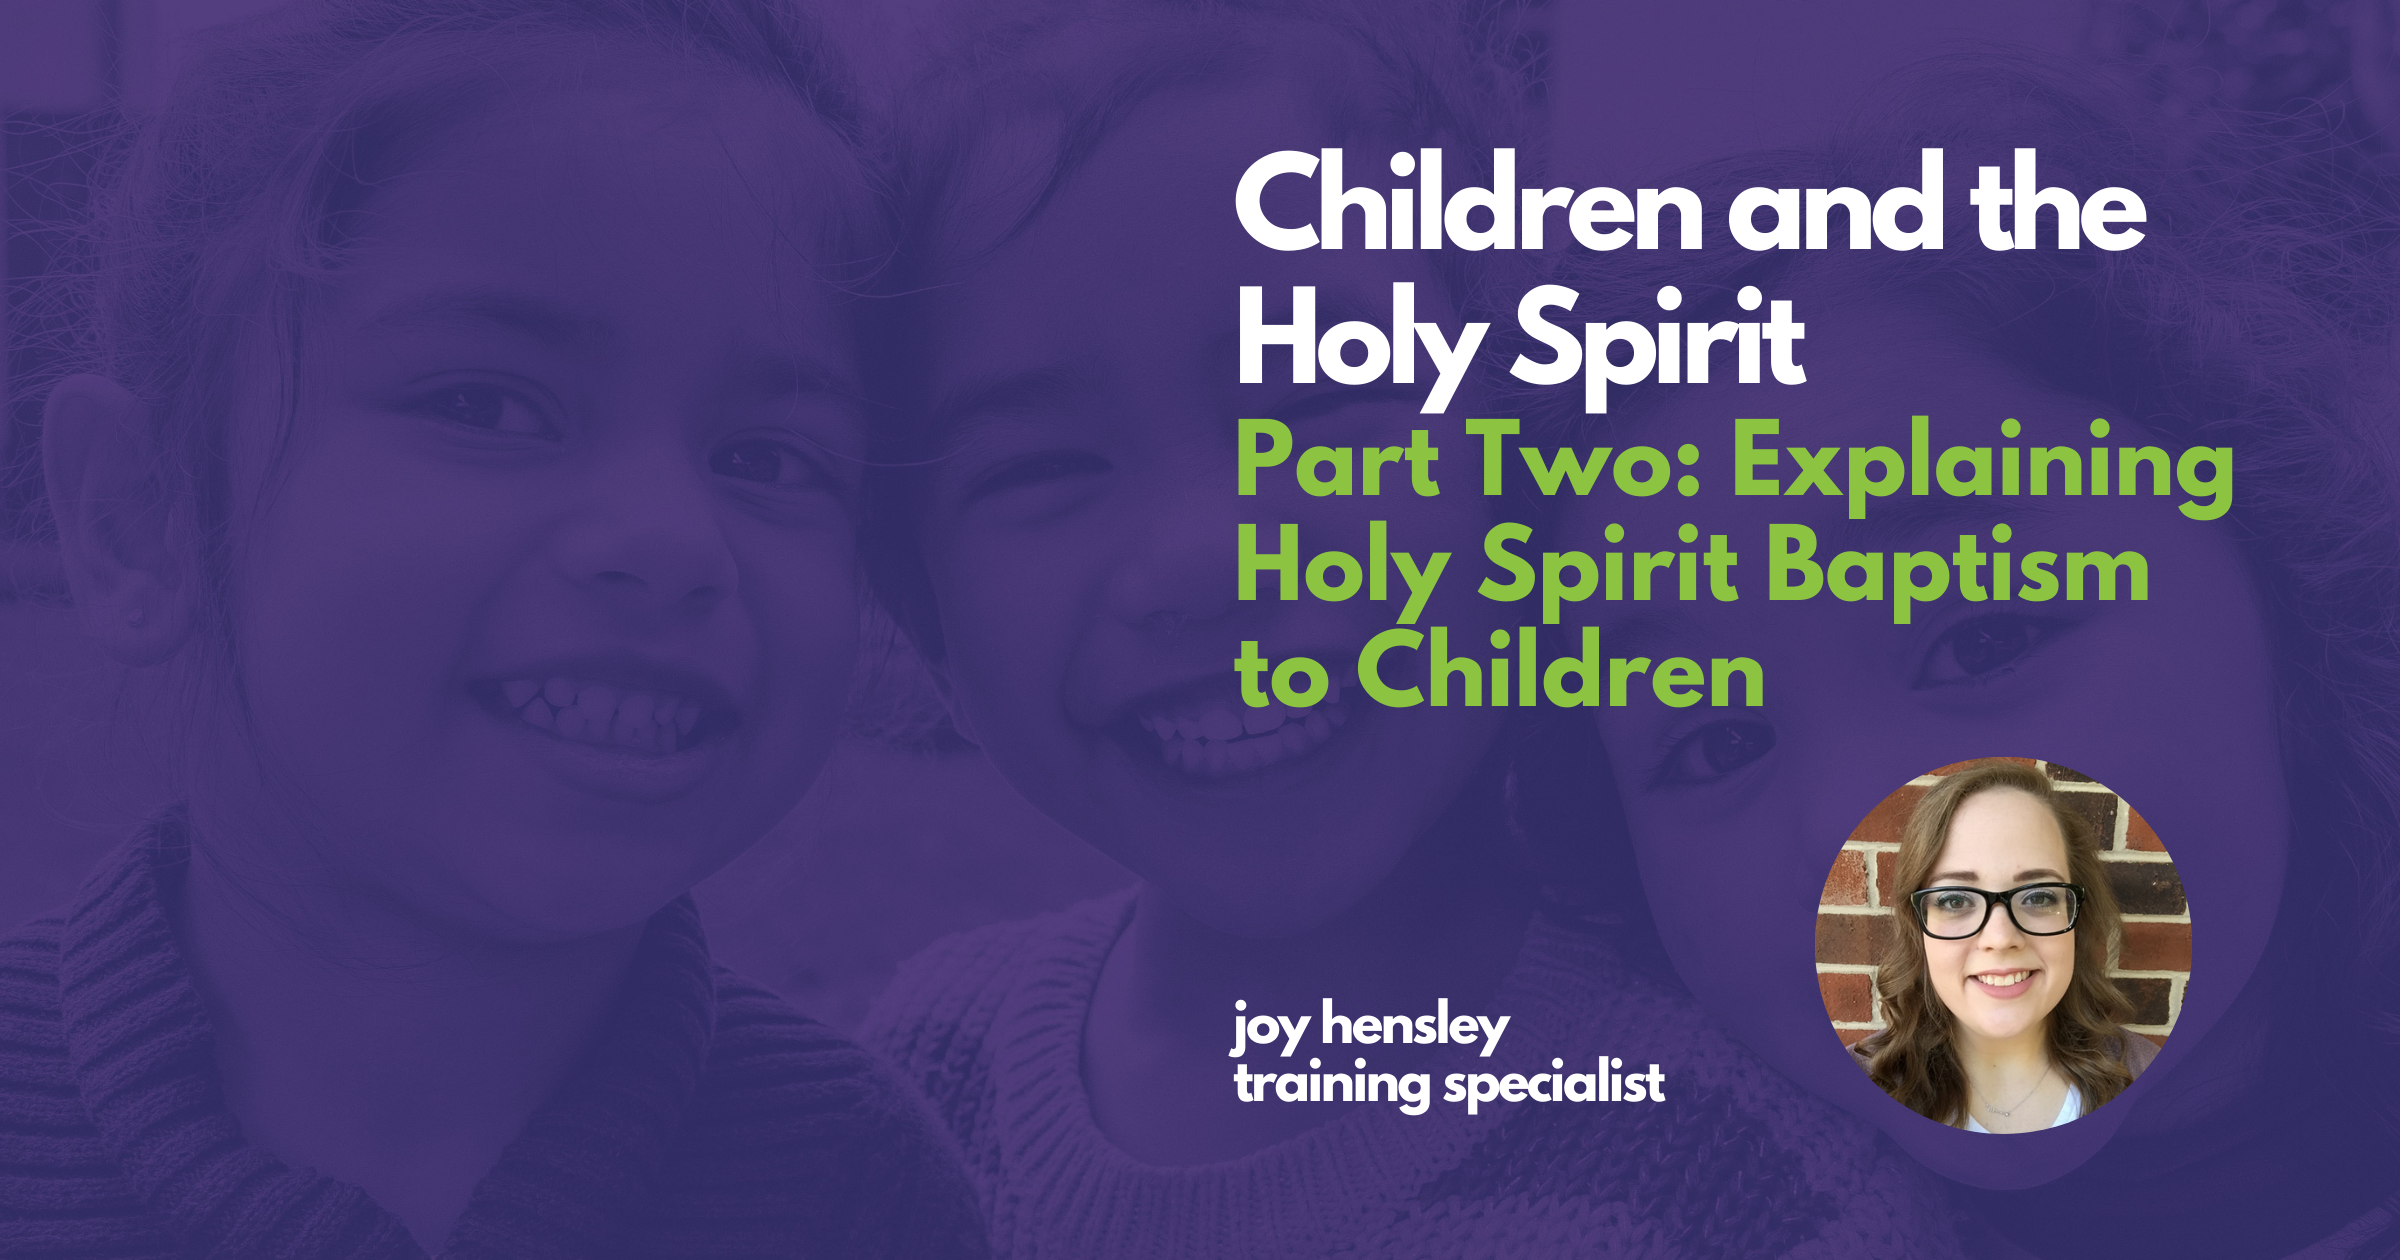 Explaining Holy Spirit Baptism to Children